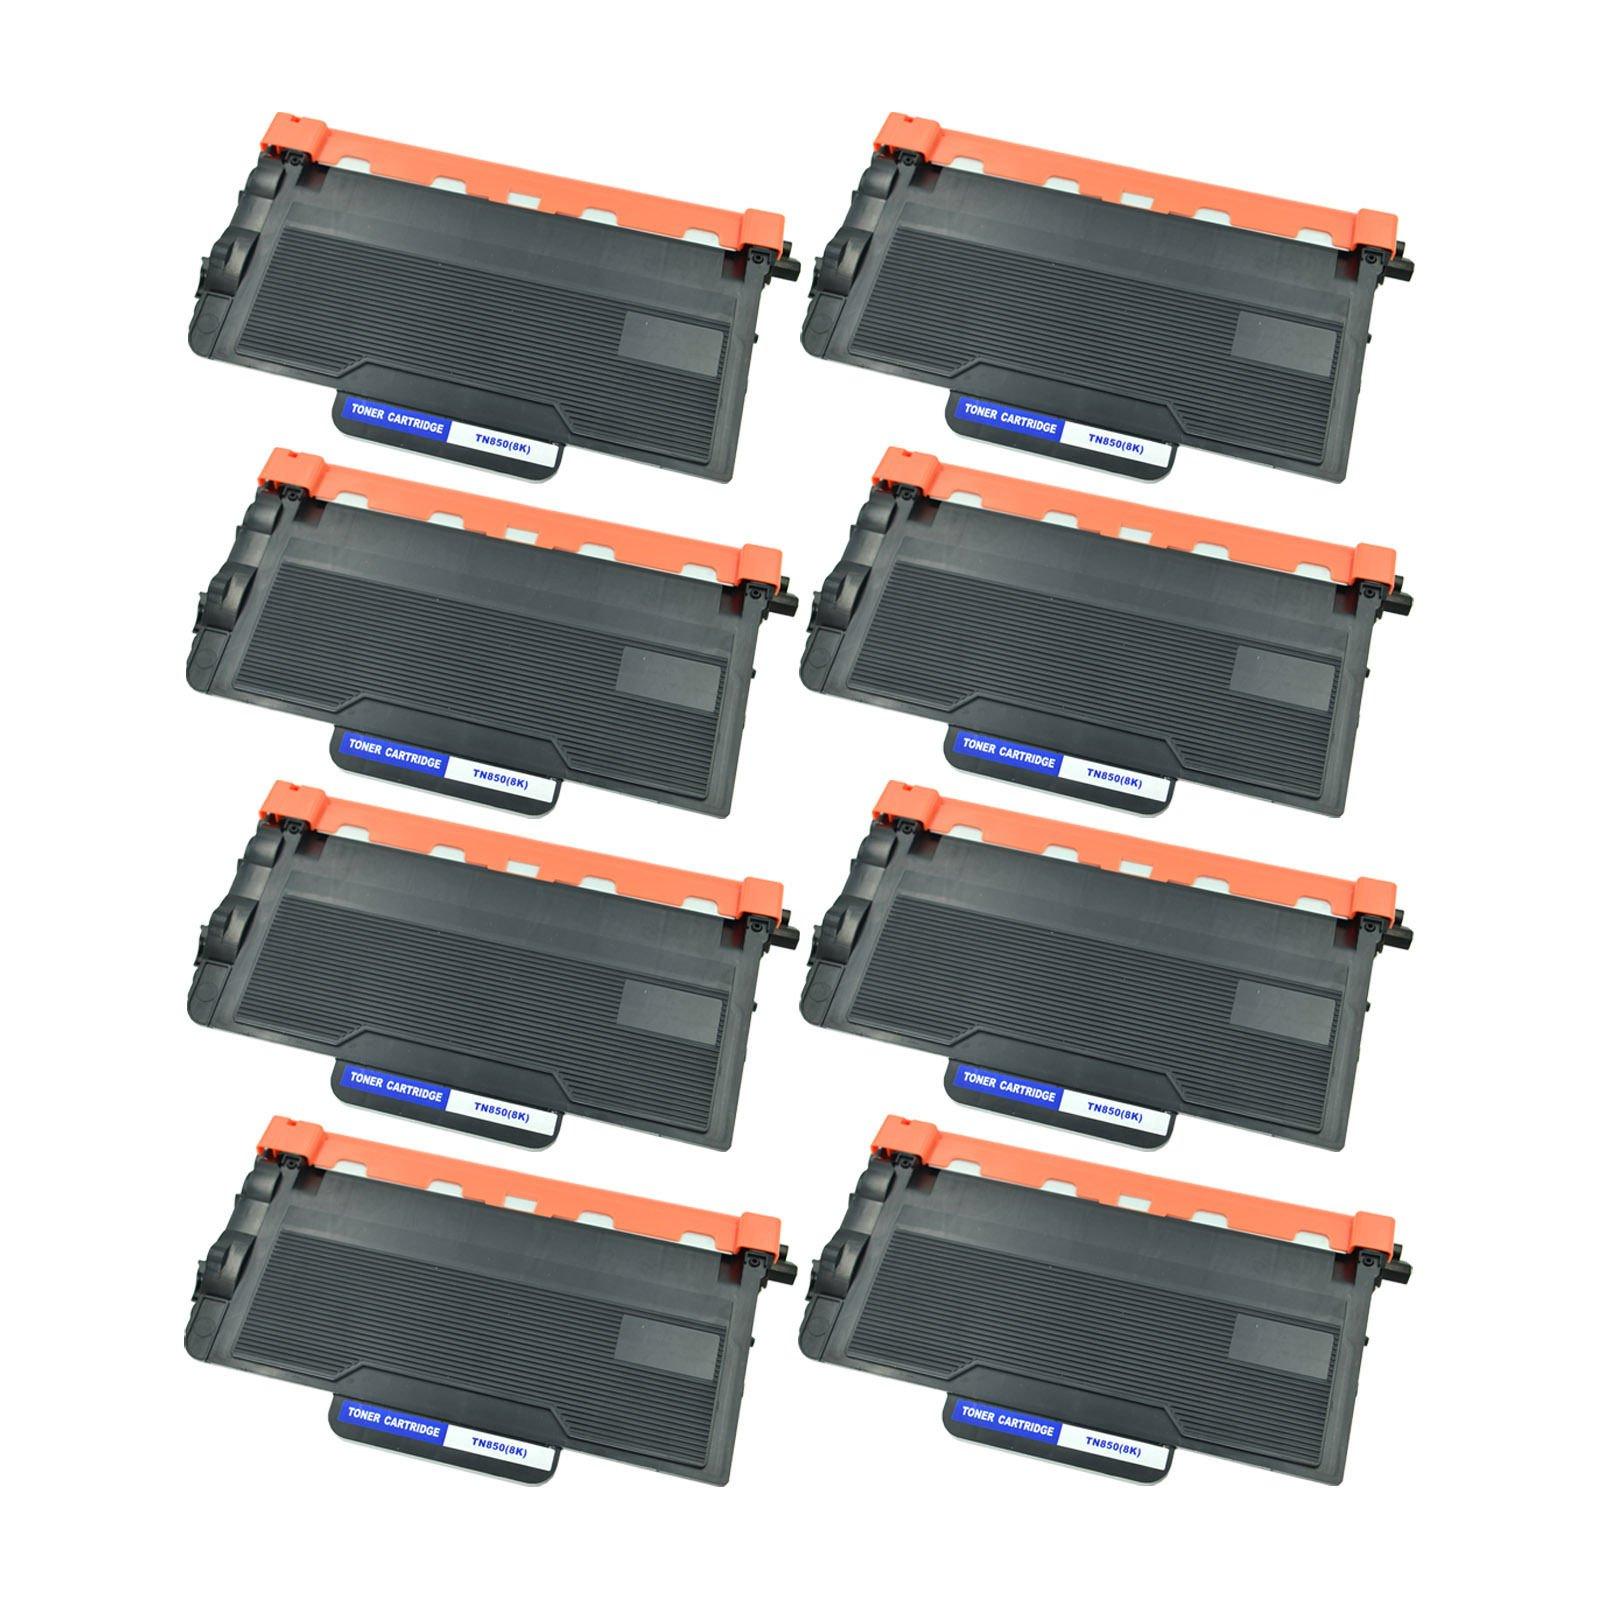 Febe New Compatible TN850 Laser Toner Cartridge for Brother MFC-L5900DW HL-L6300DW DCP-L5650DN Printers – 8 Black